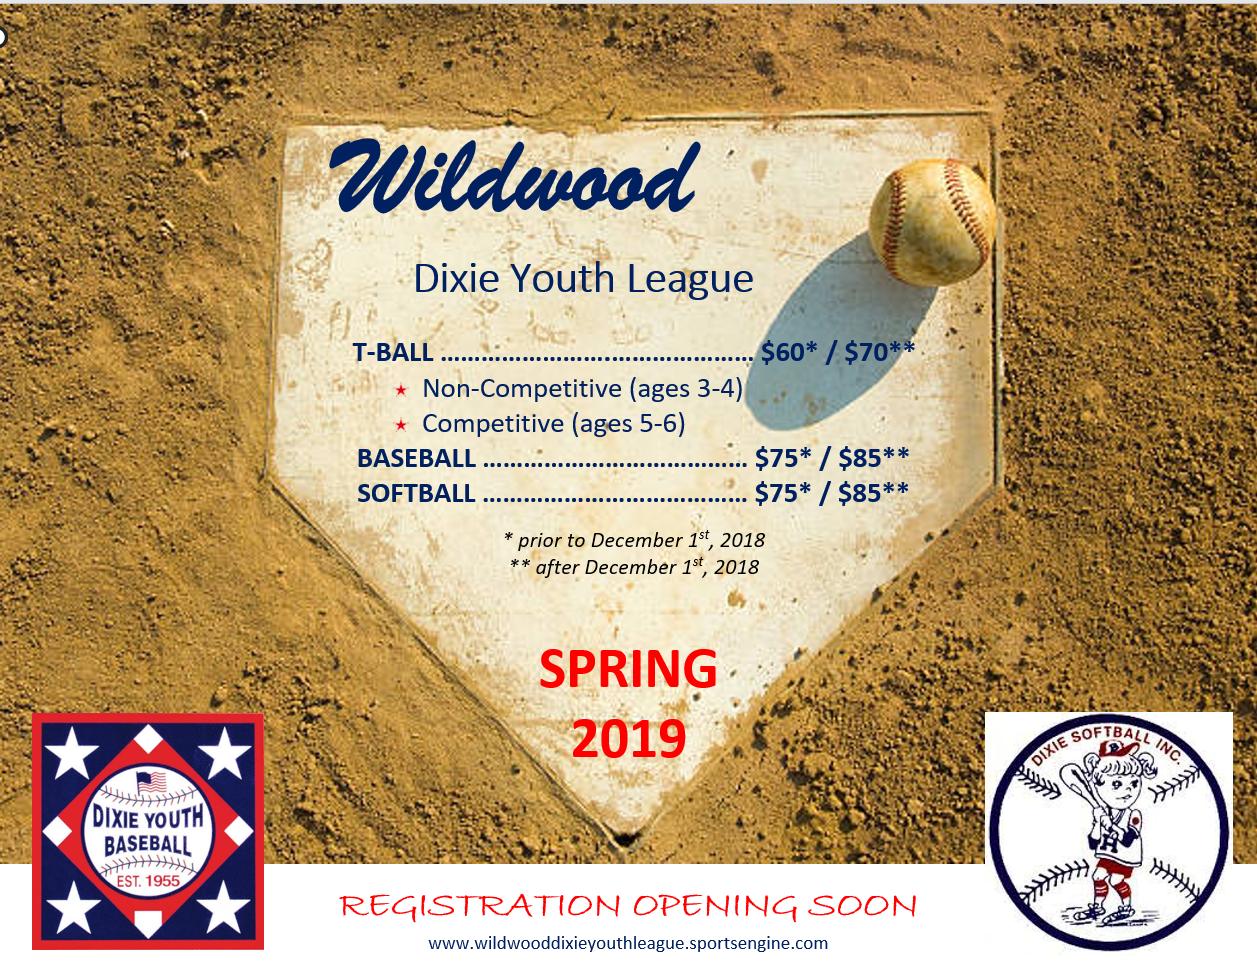 Wildwood Dixie Youth League